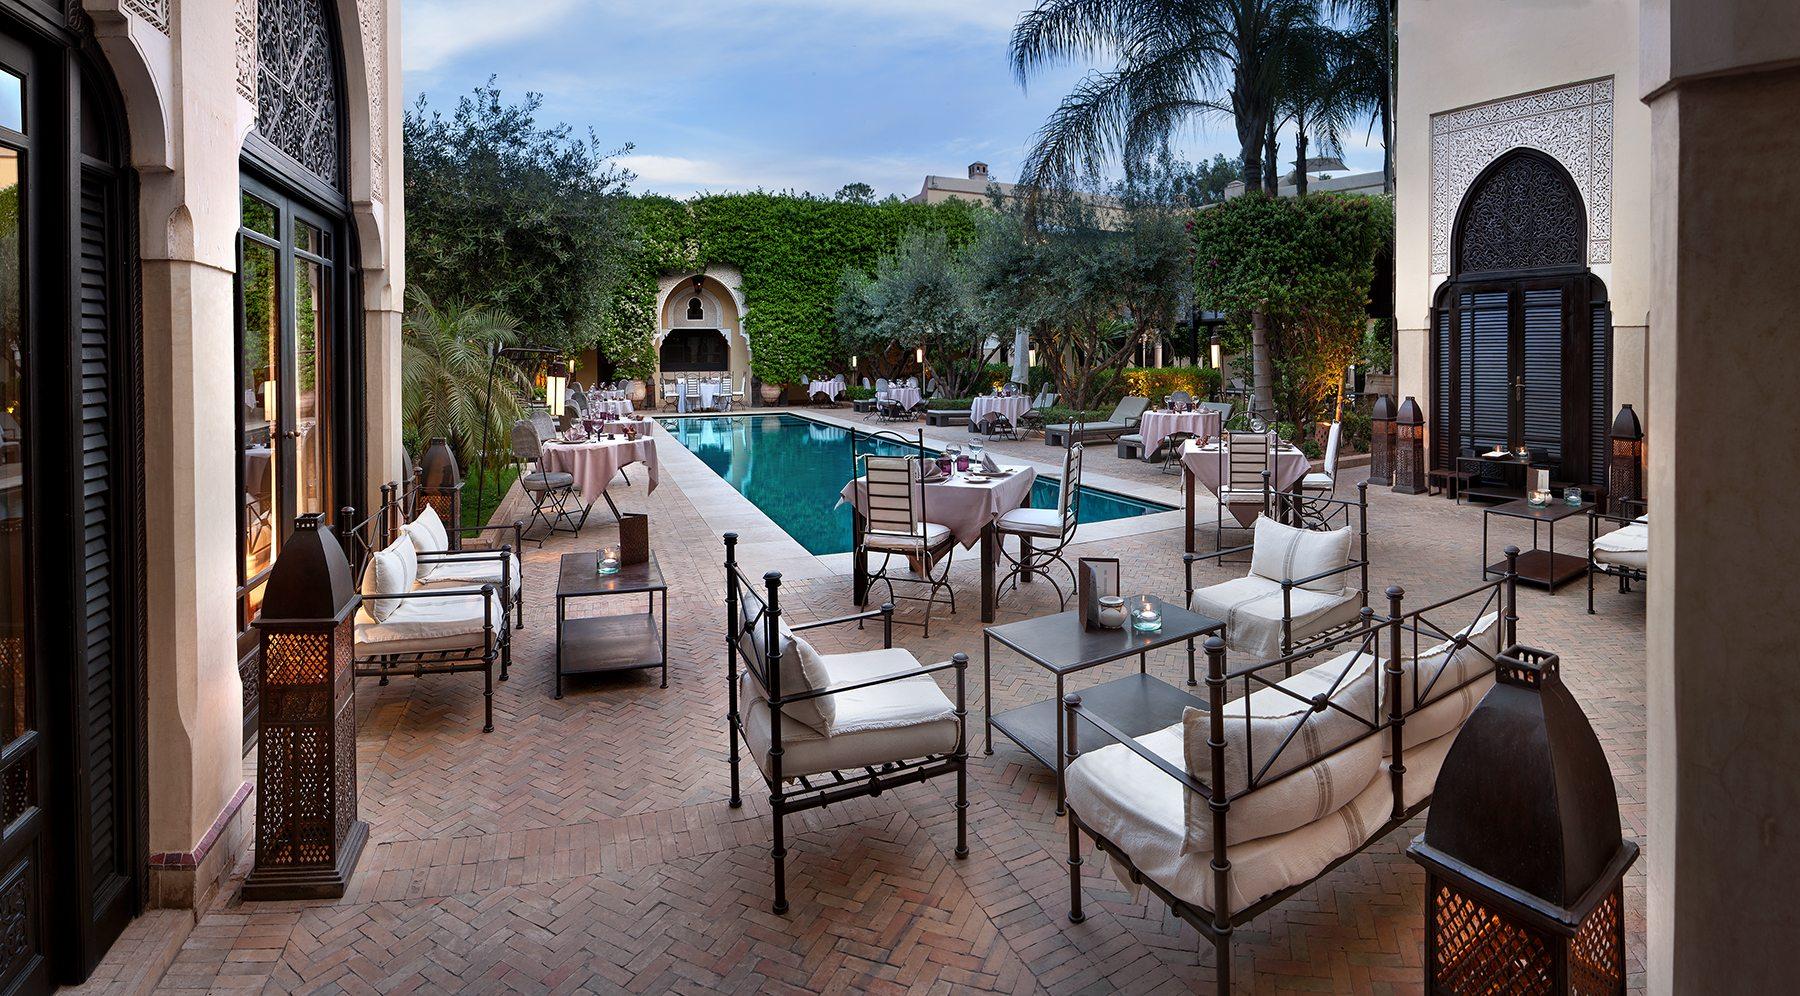 Dinner by the pool Villa des Orangers